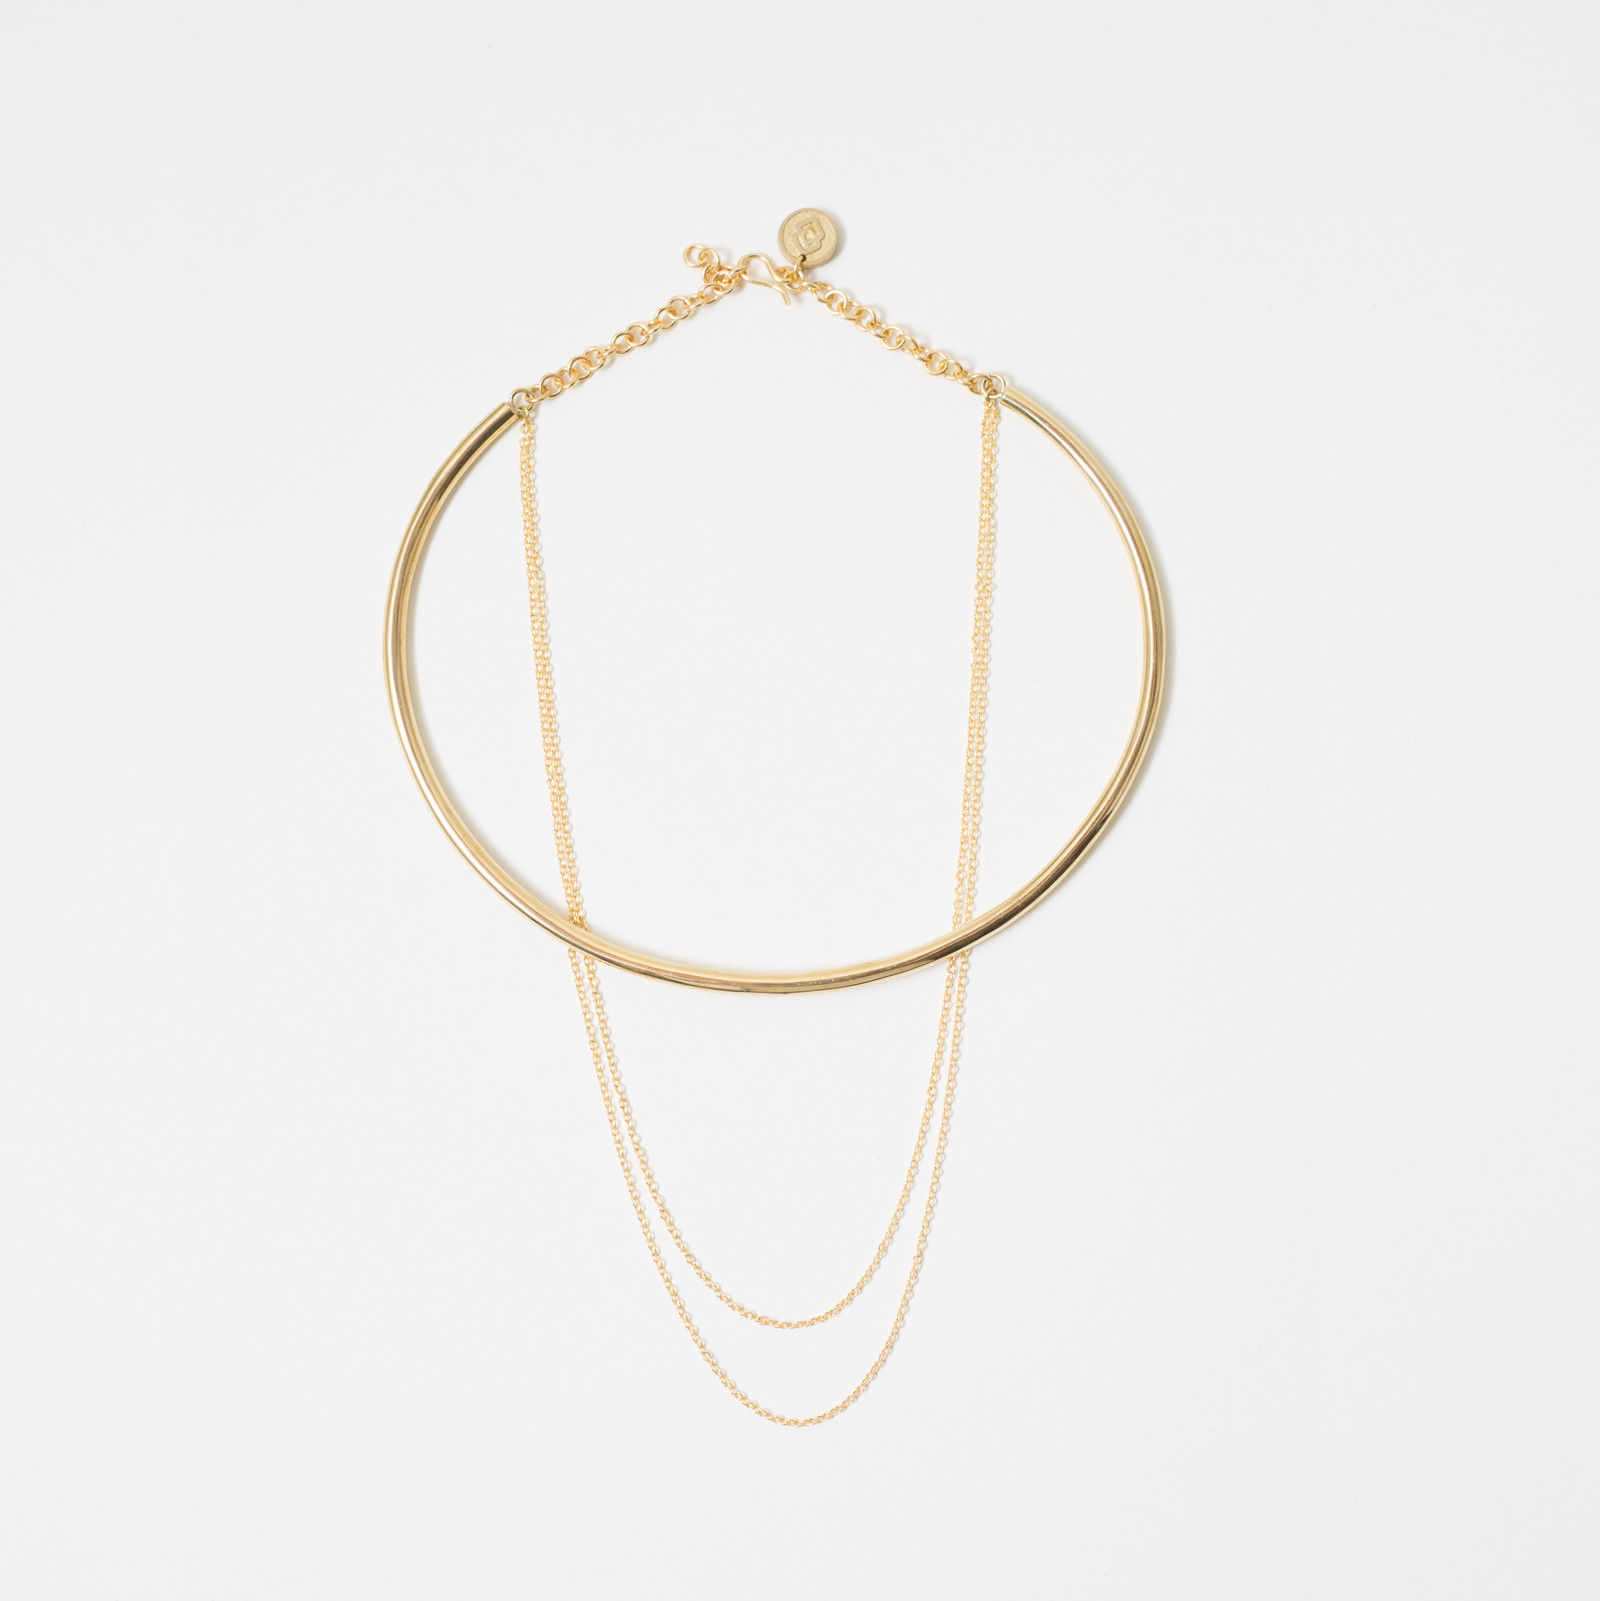 Delicate Chain Choker, $95   Photo via shopsoko.com